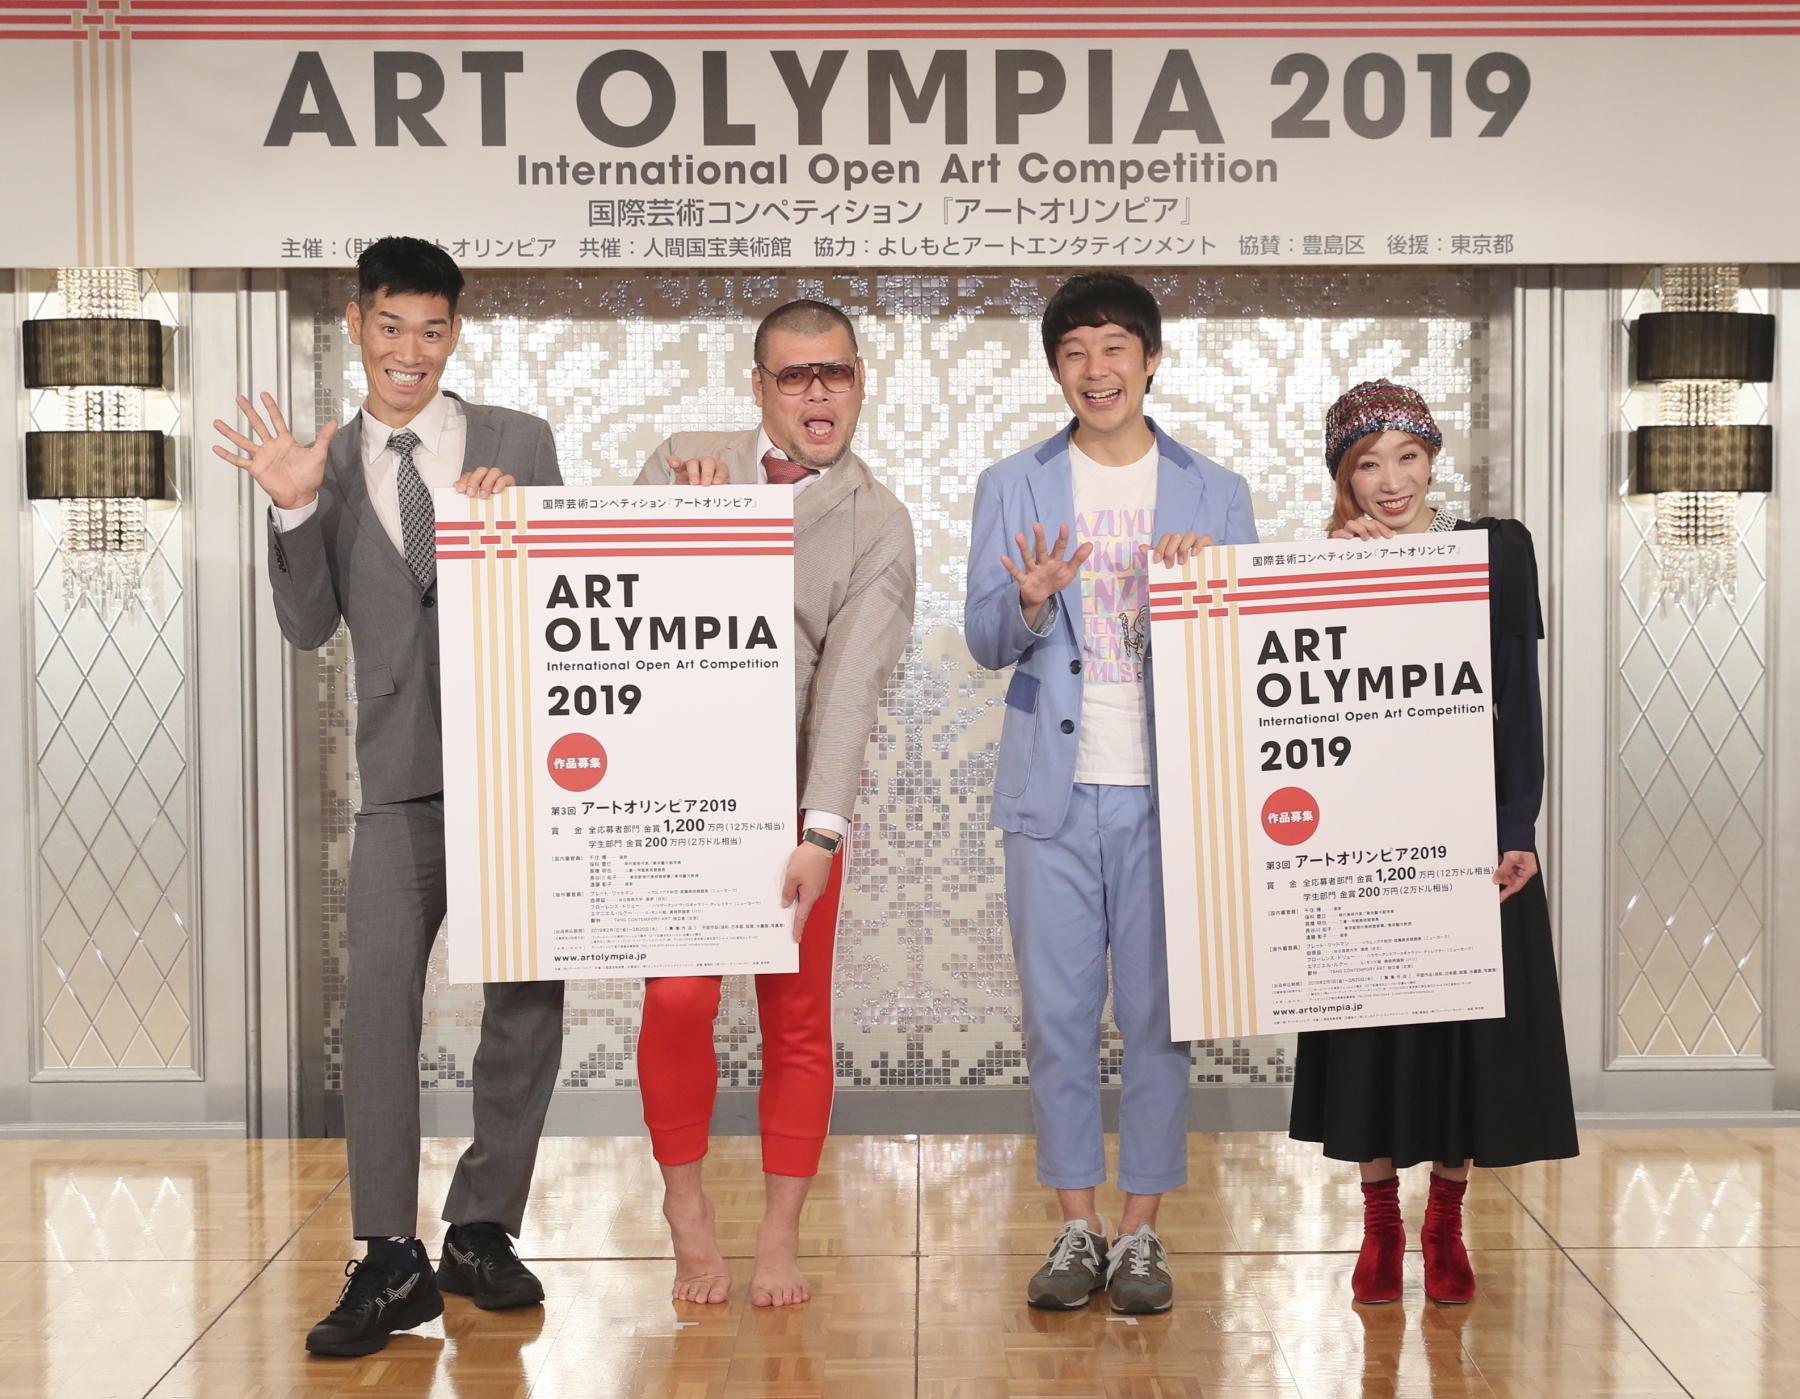 http://news.yoshimoto.co.jp/20181116154018-f333cd0711f5f89397384a849a4f6466368469f4.jpg